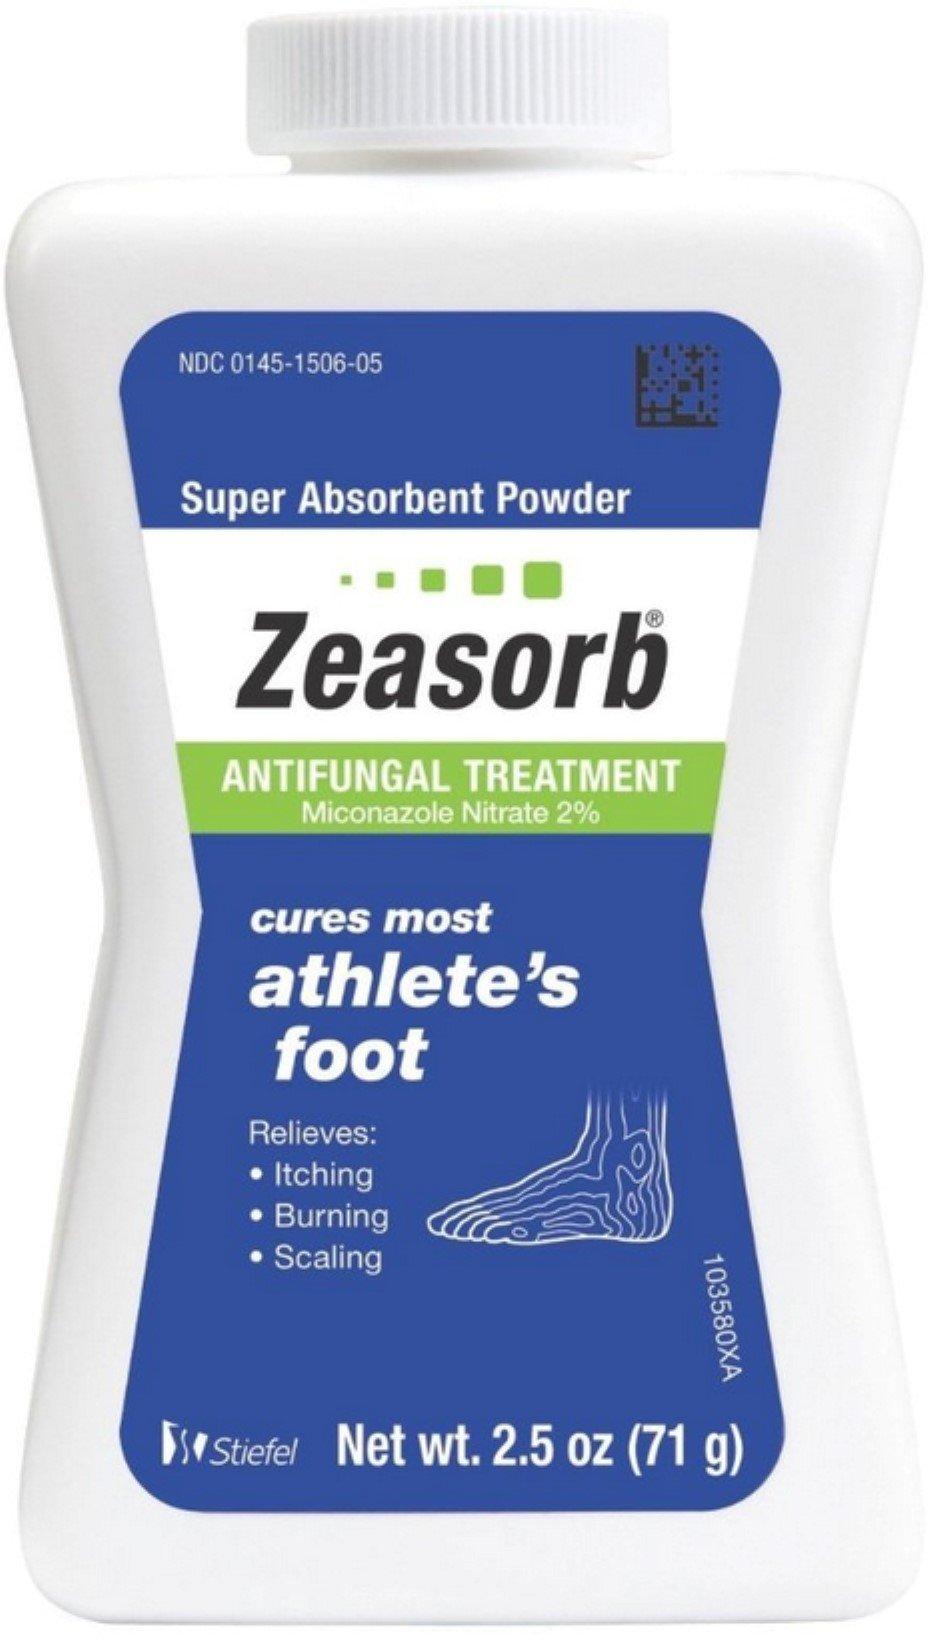 Zeasorb-AF Antifungal Powder 2.50 oz (Pack of 12) by Zeasorb